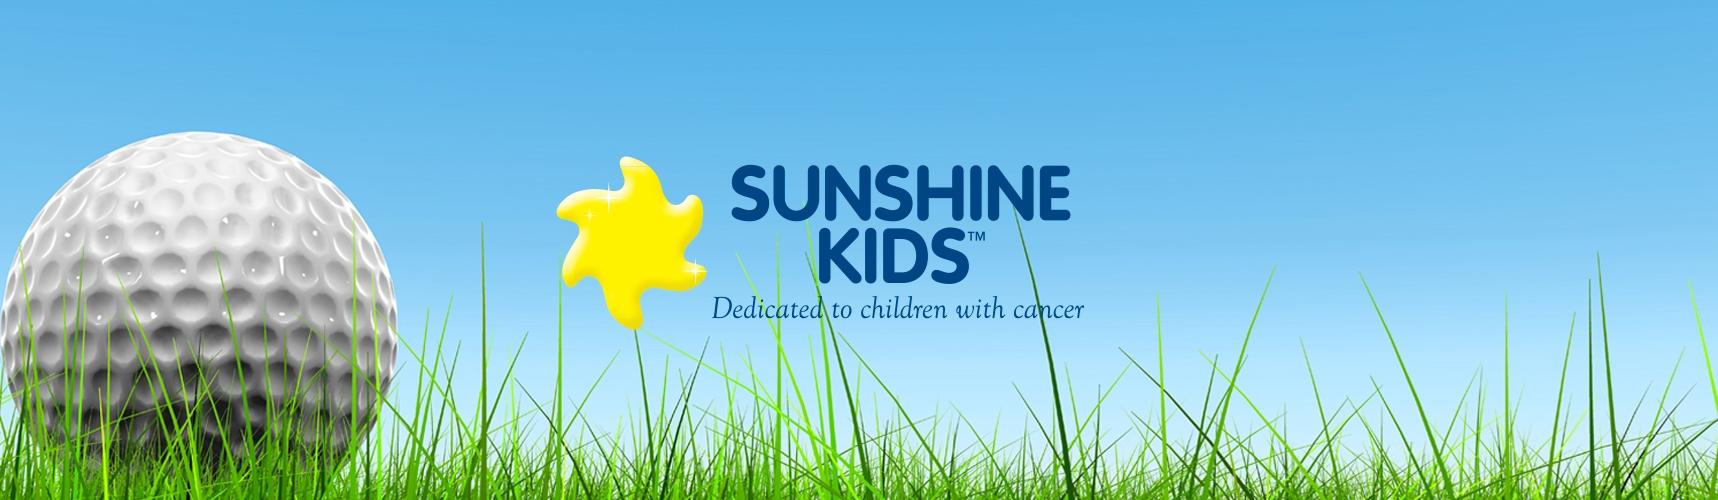 Sunshine Kids Charity Golf Event